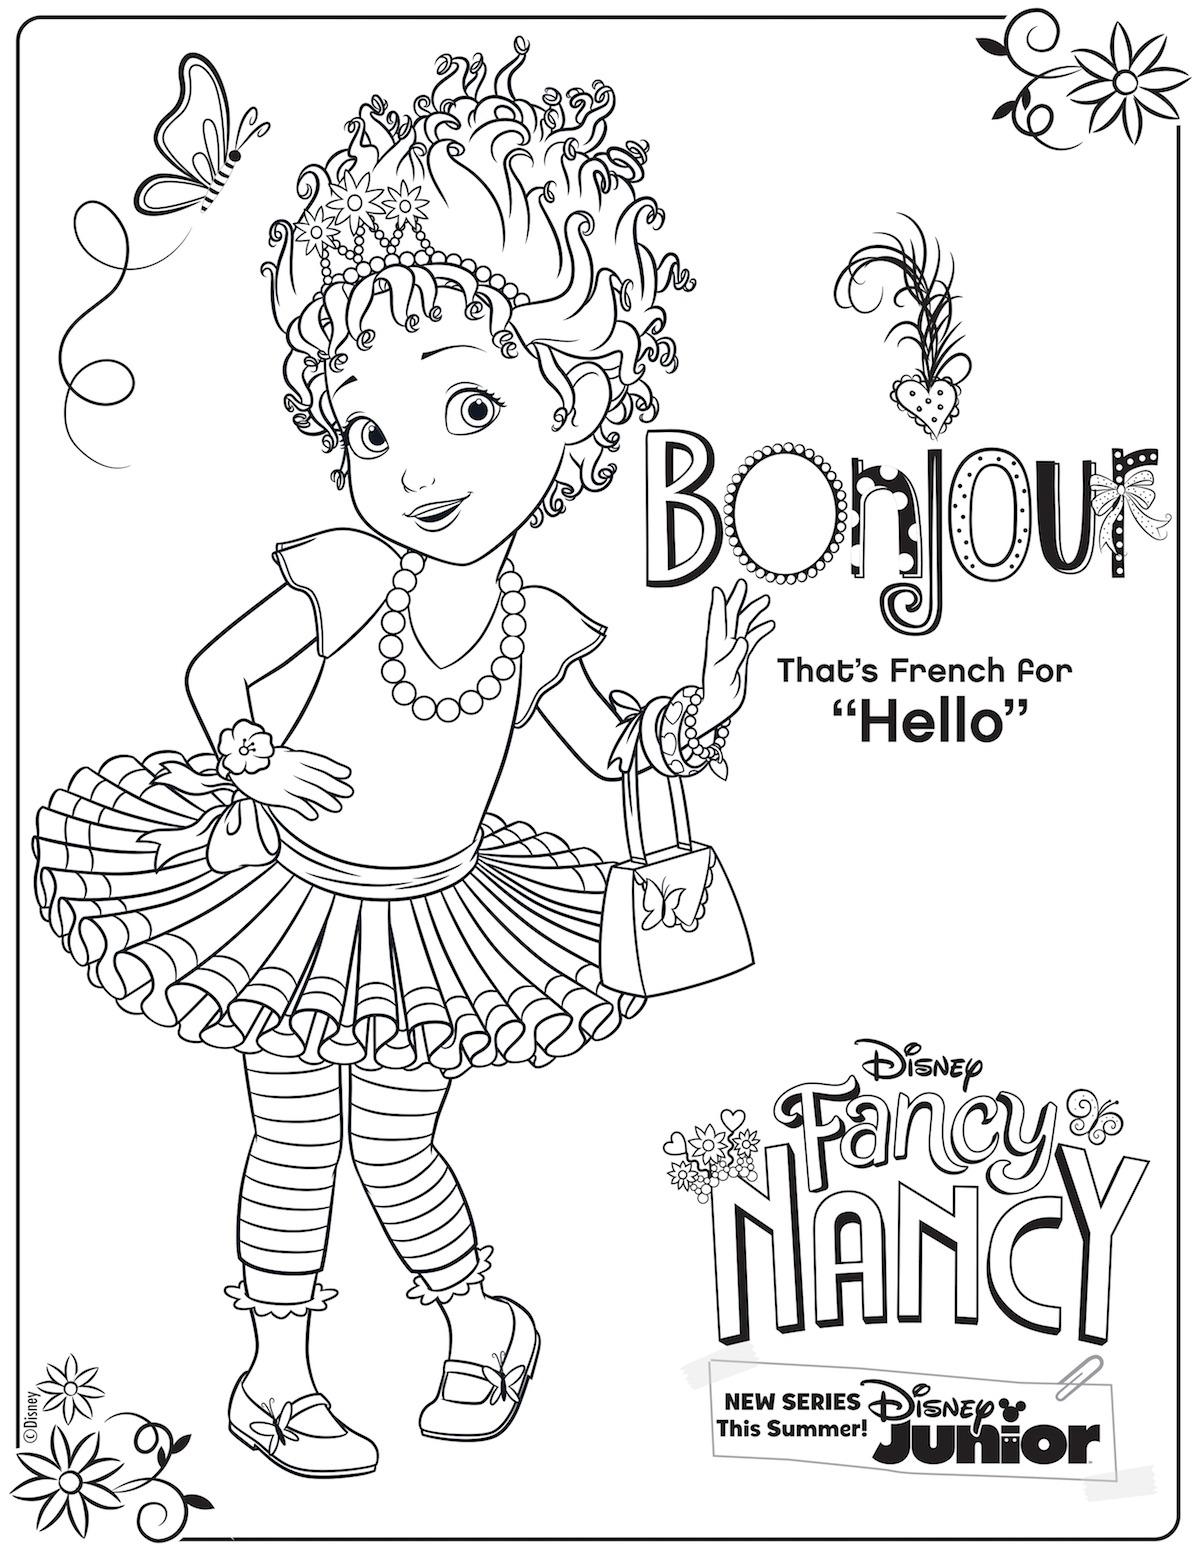 Fancy Nancy Volume 1 Coming To Dvd November 20th! + Free